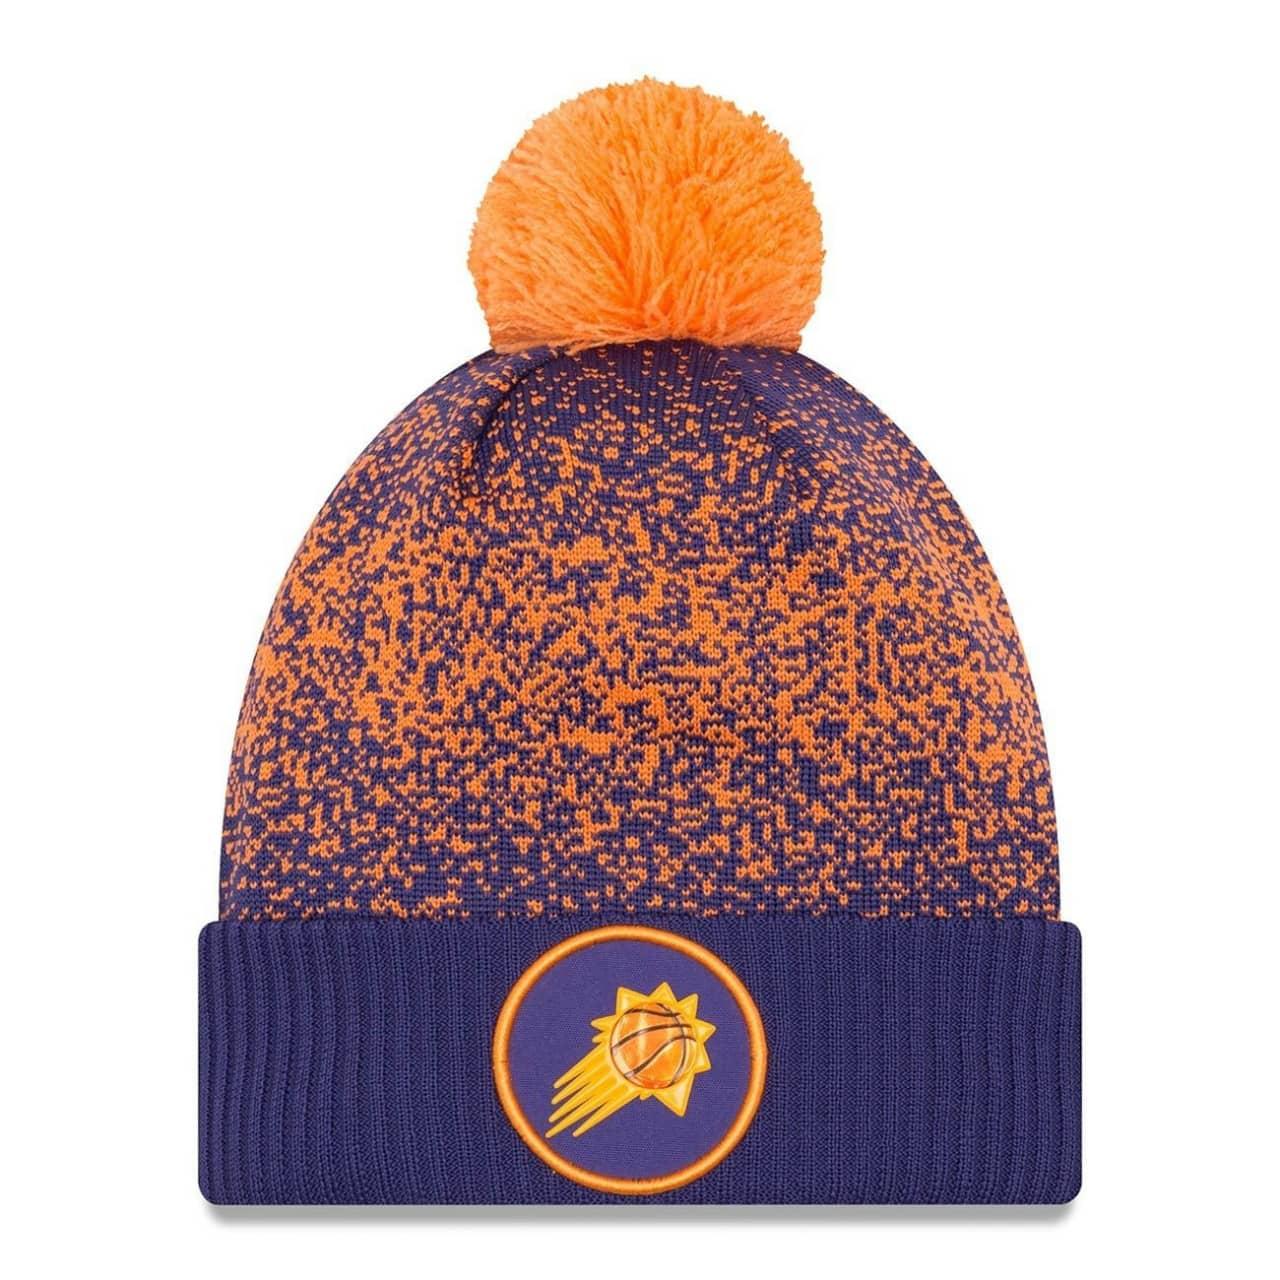 f265a8ead1c4e7 New Era Phoenix Suns 2017 On-Court NBA Knit Hat | TAASS.com Fan Shop